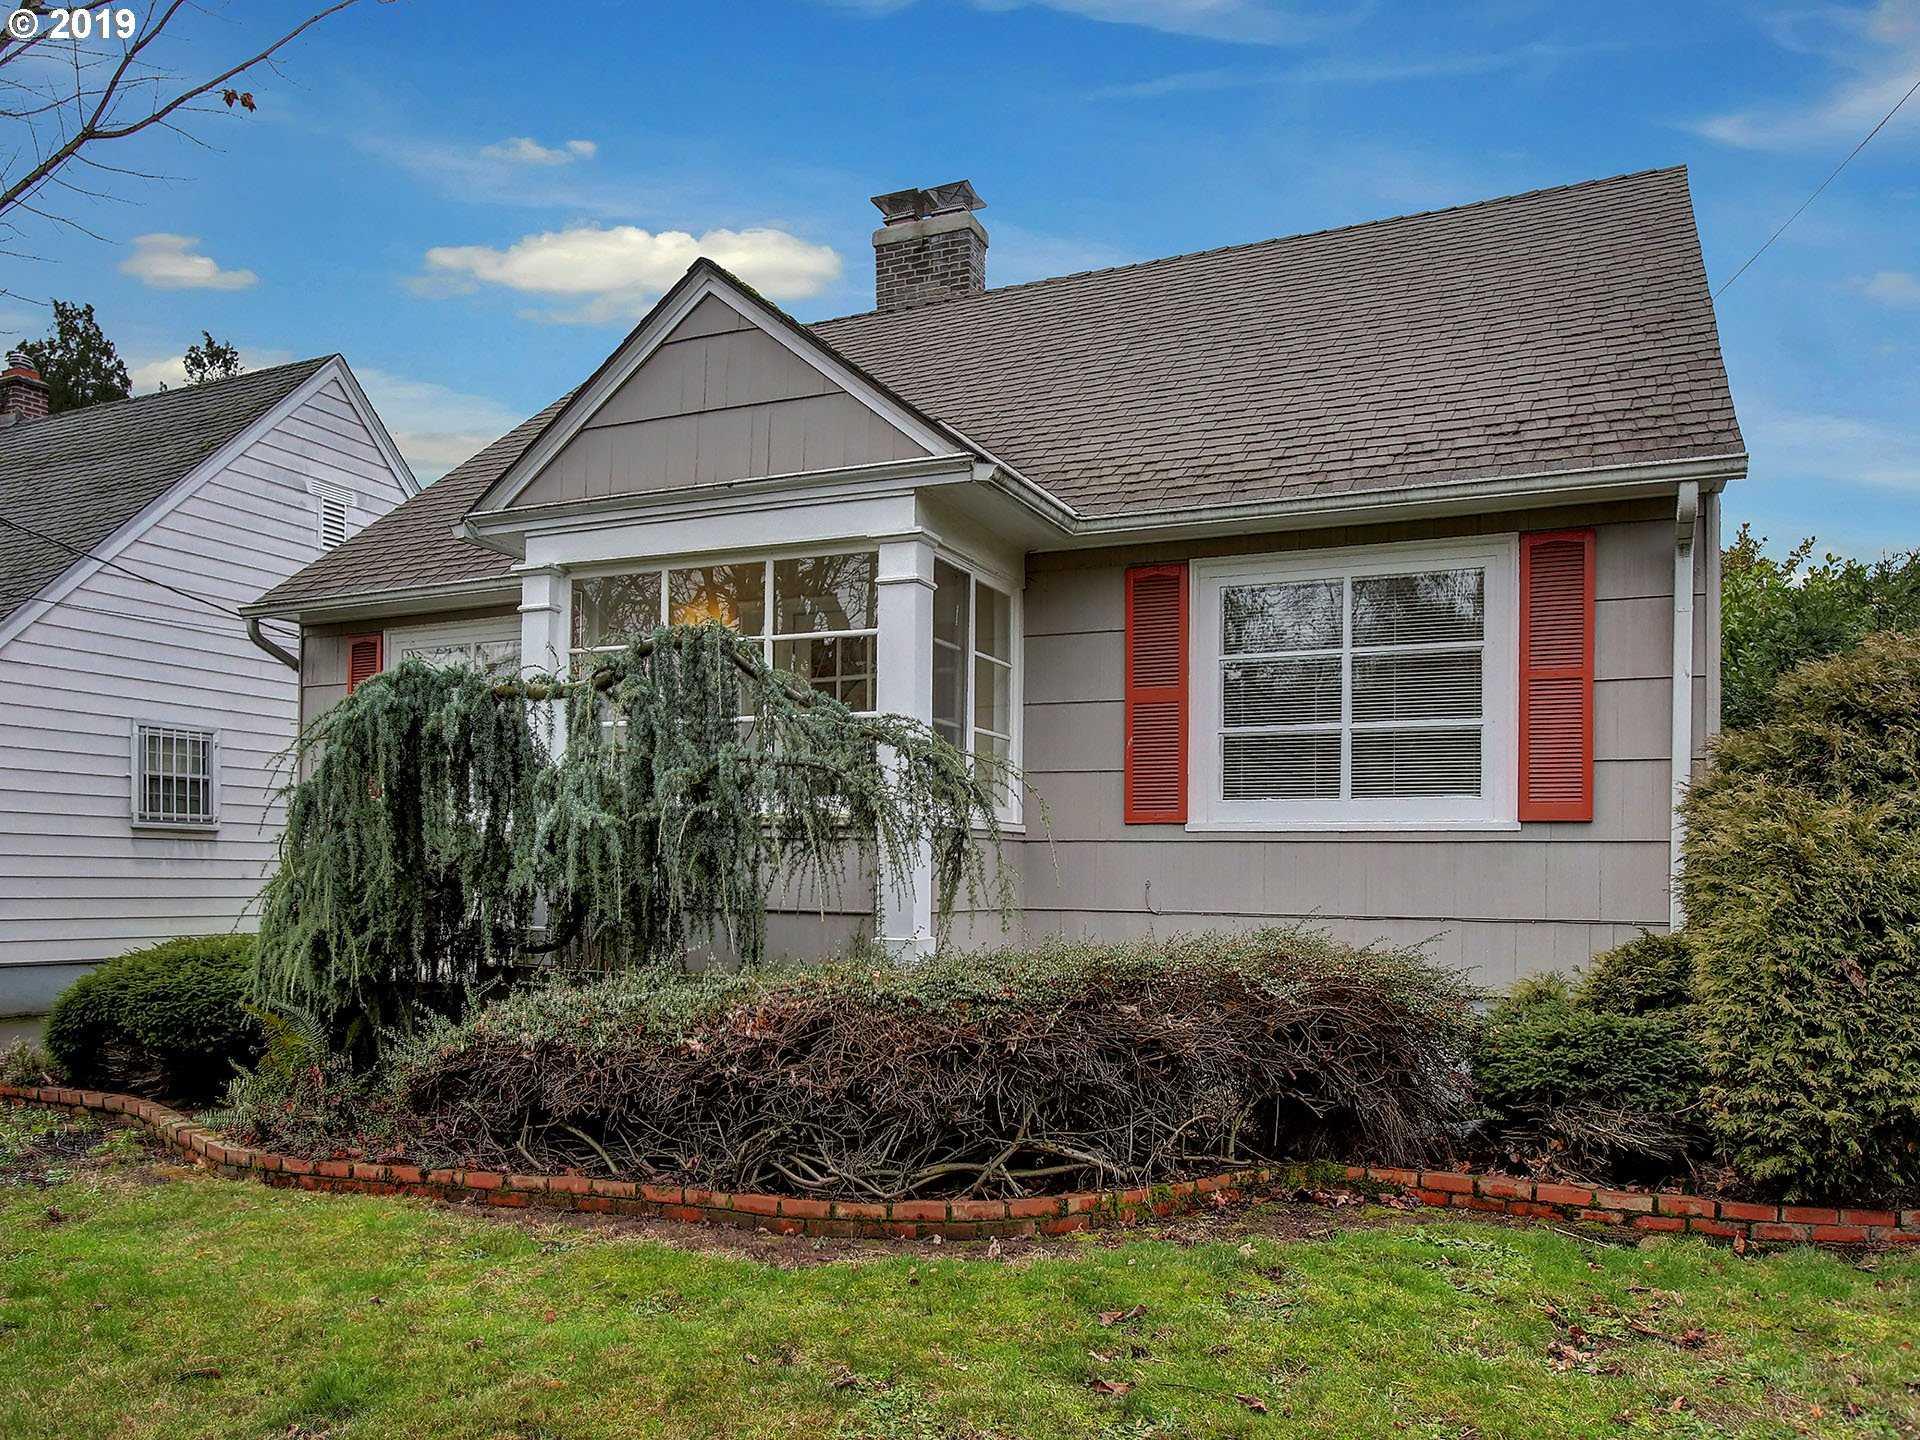 $495,000 - 3Br/2Ba -  for Sale in Overlook, Portland